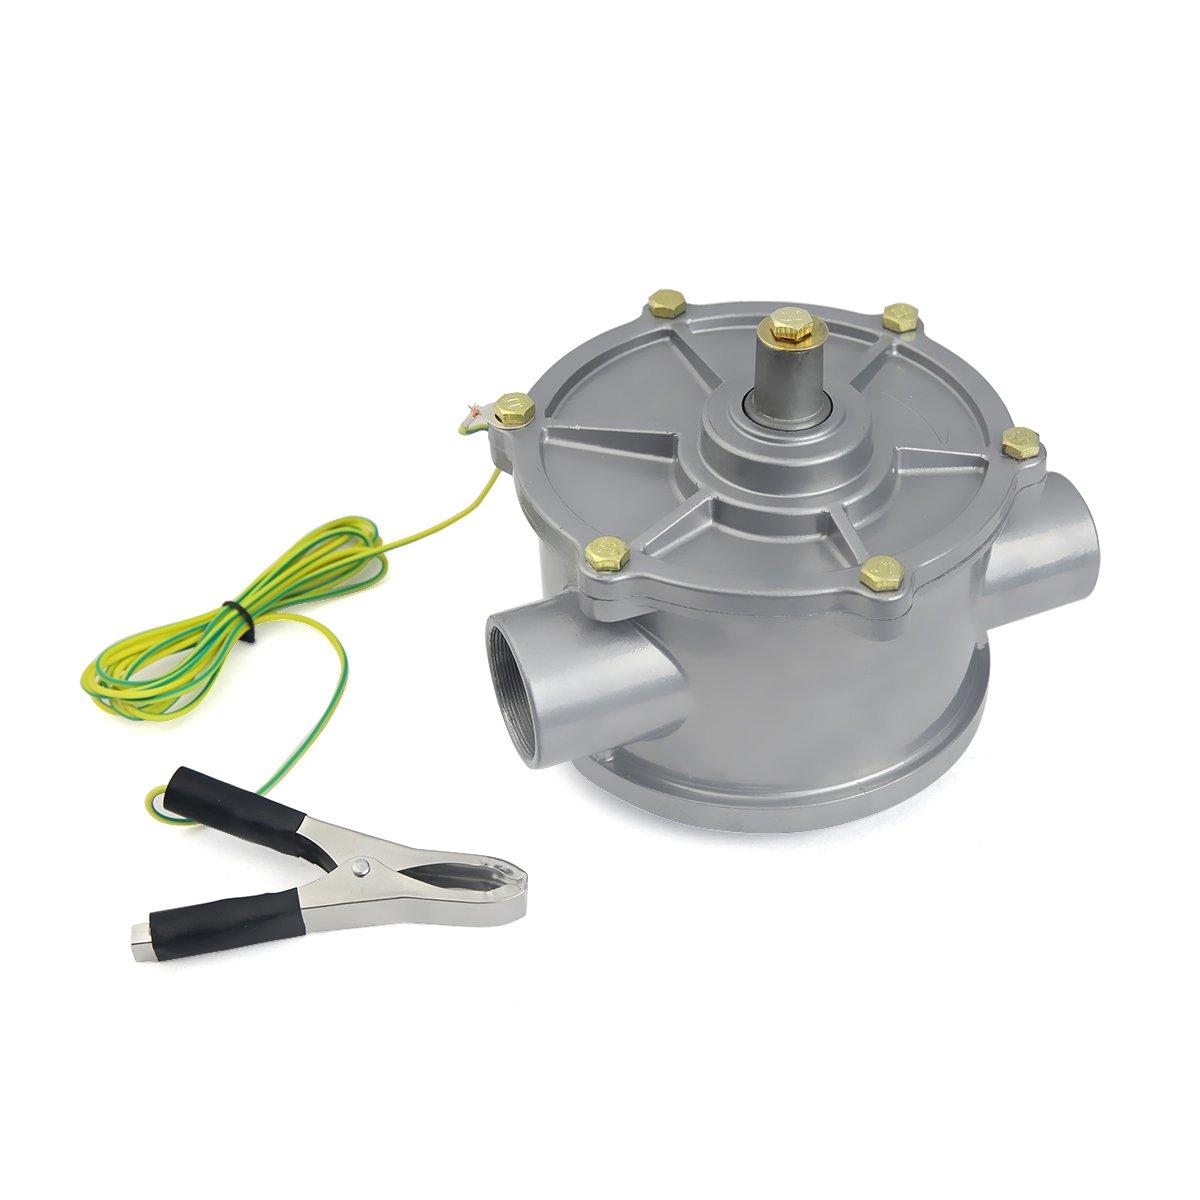 STKUSA 35-Gallon Portable Fuel Transfer Gas Can Caddy Storage Tank 35gal-Capacity Pump w/Wheel by STKUSA (Image #8)